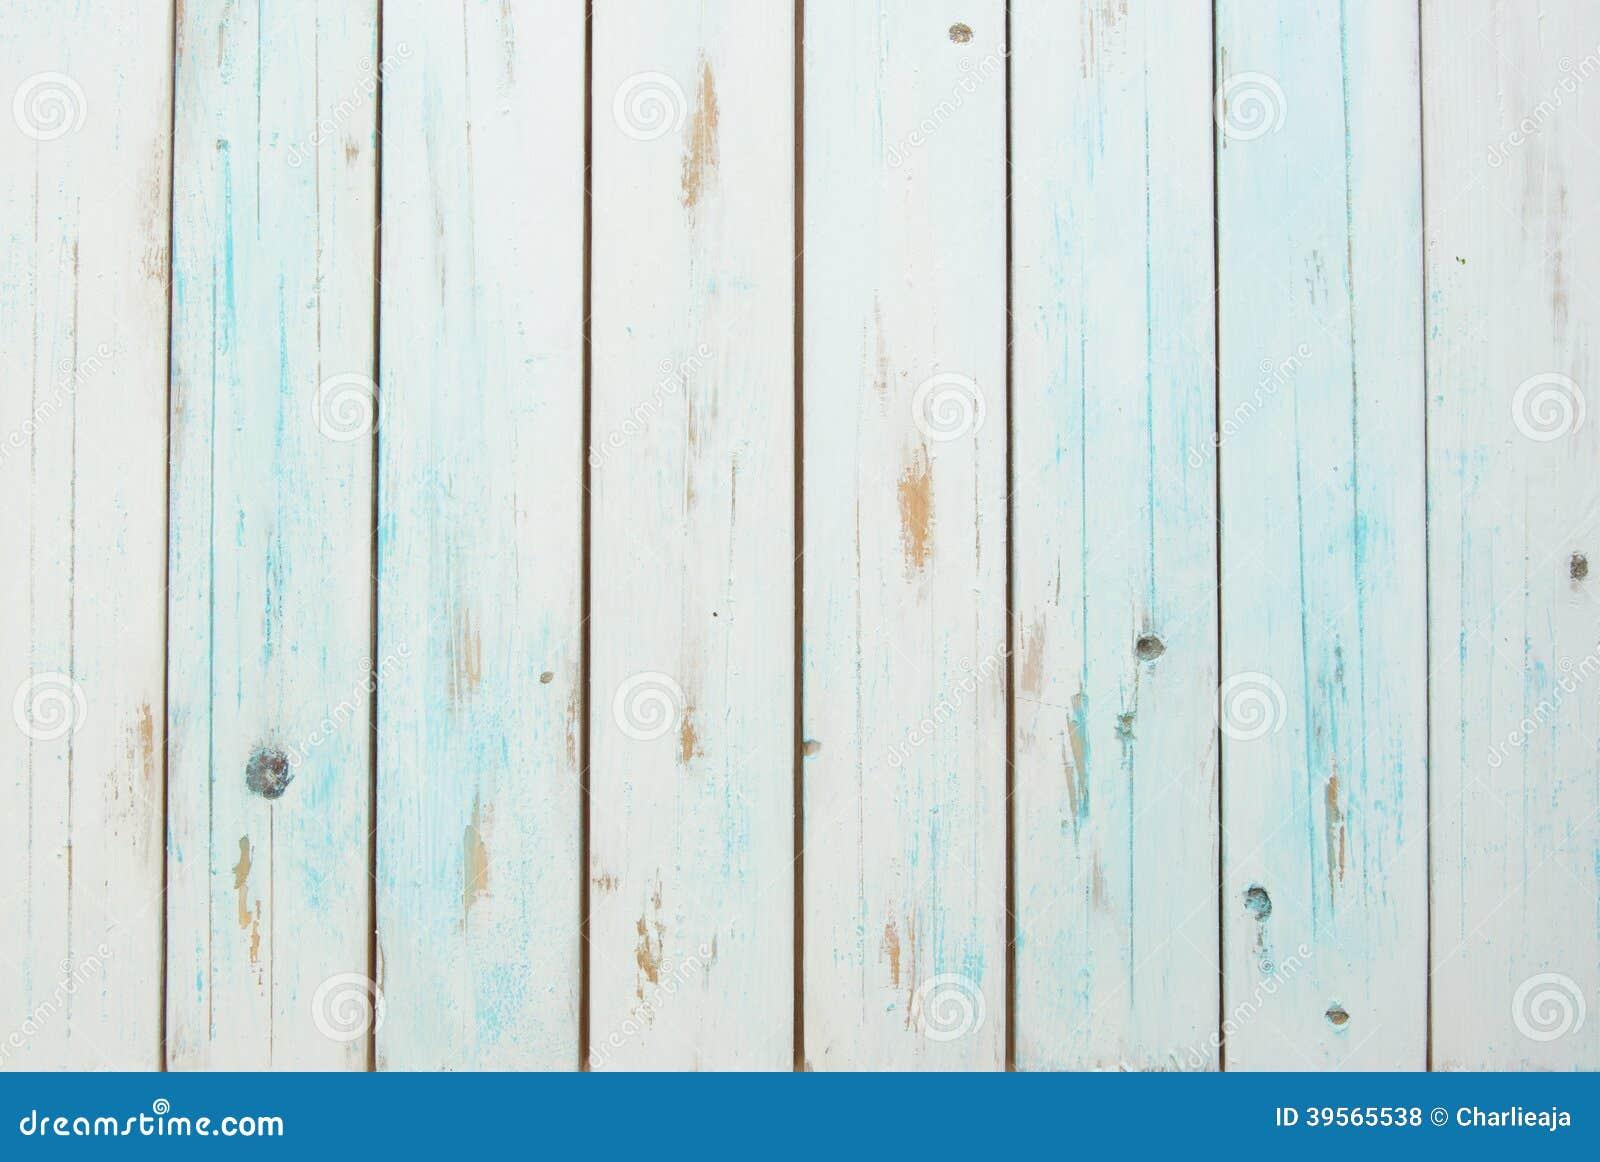 Wood Texture White Background Stock Photo Image 39565538